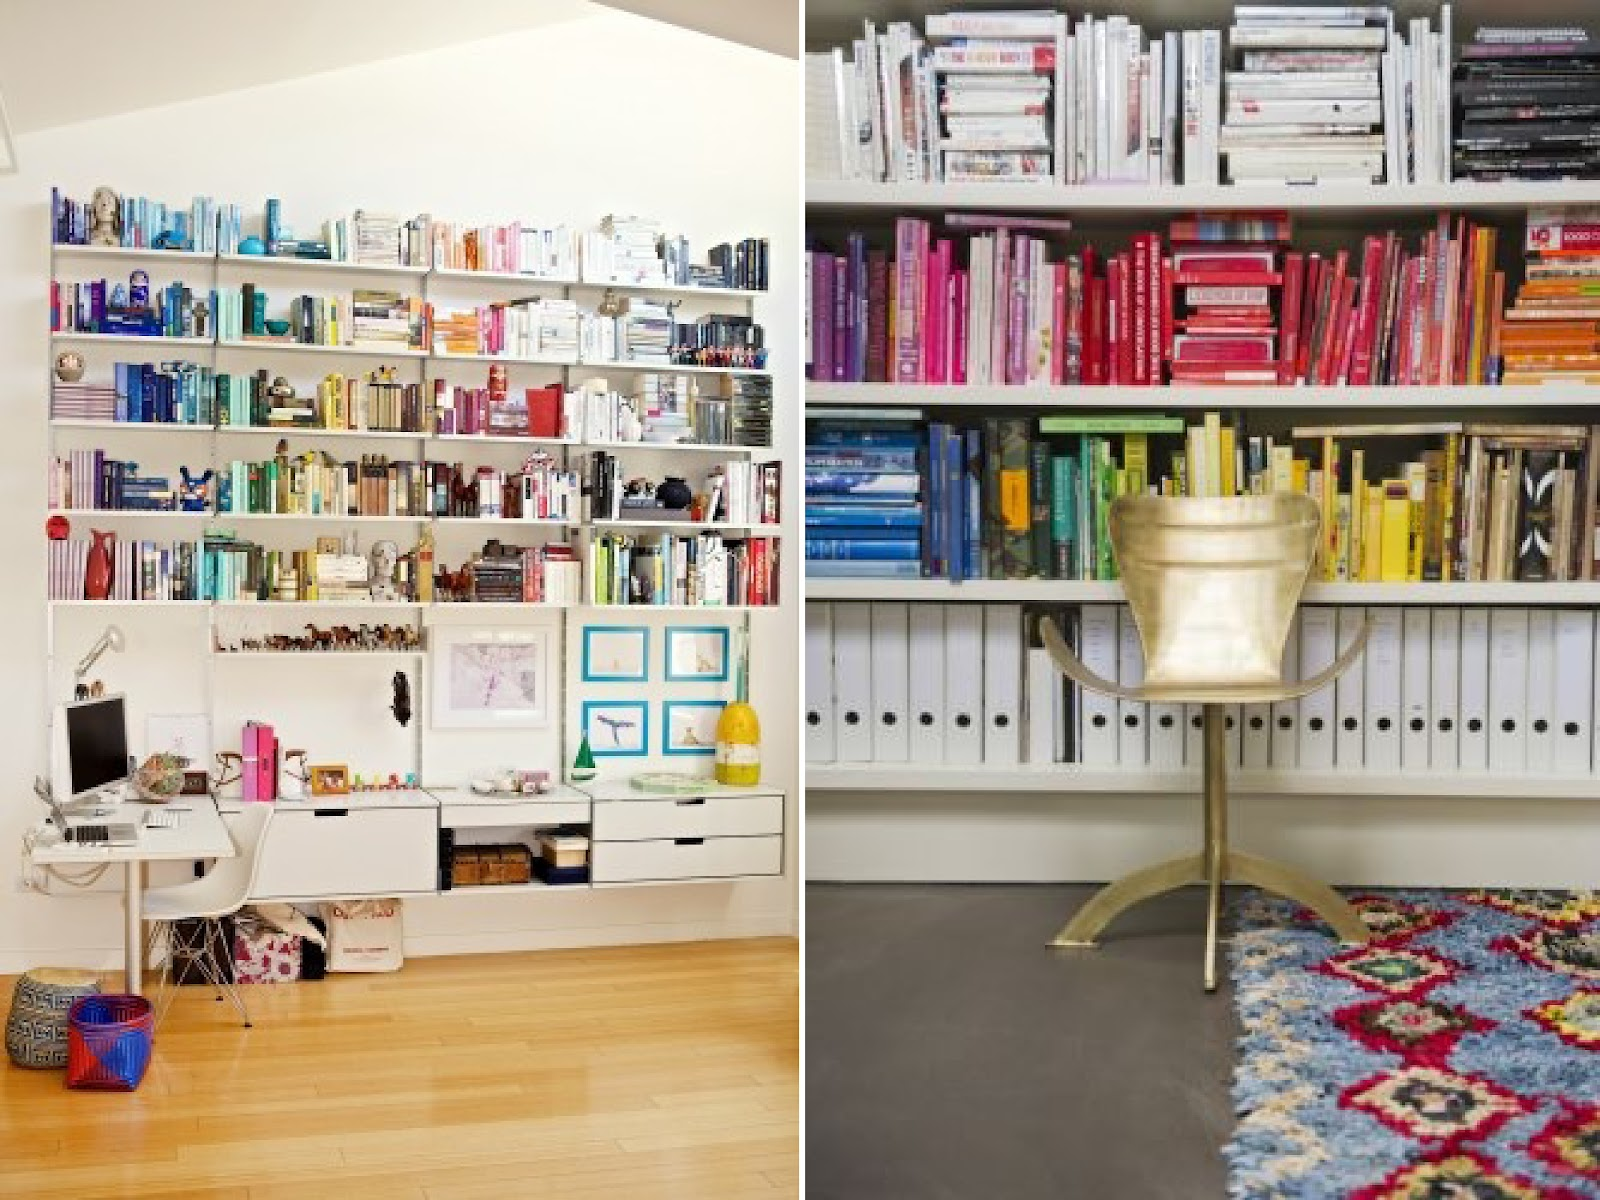 Co colour coordinated bookshelf - Pin It